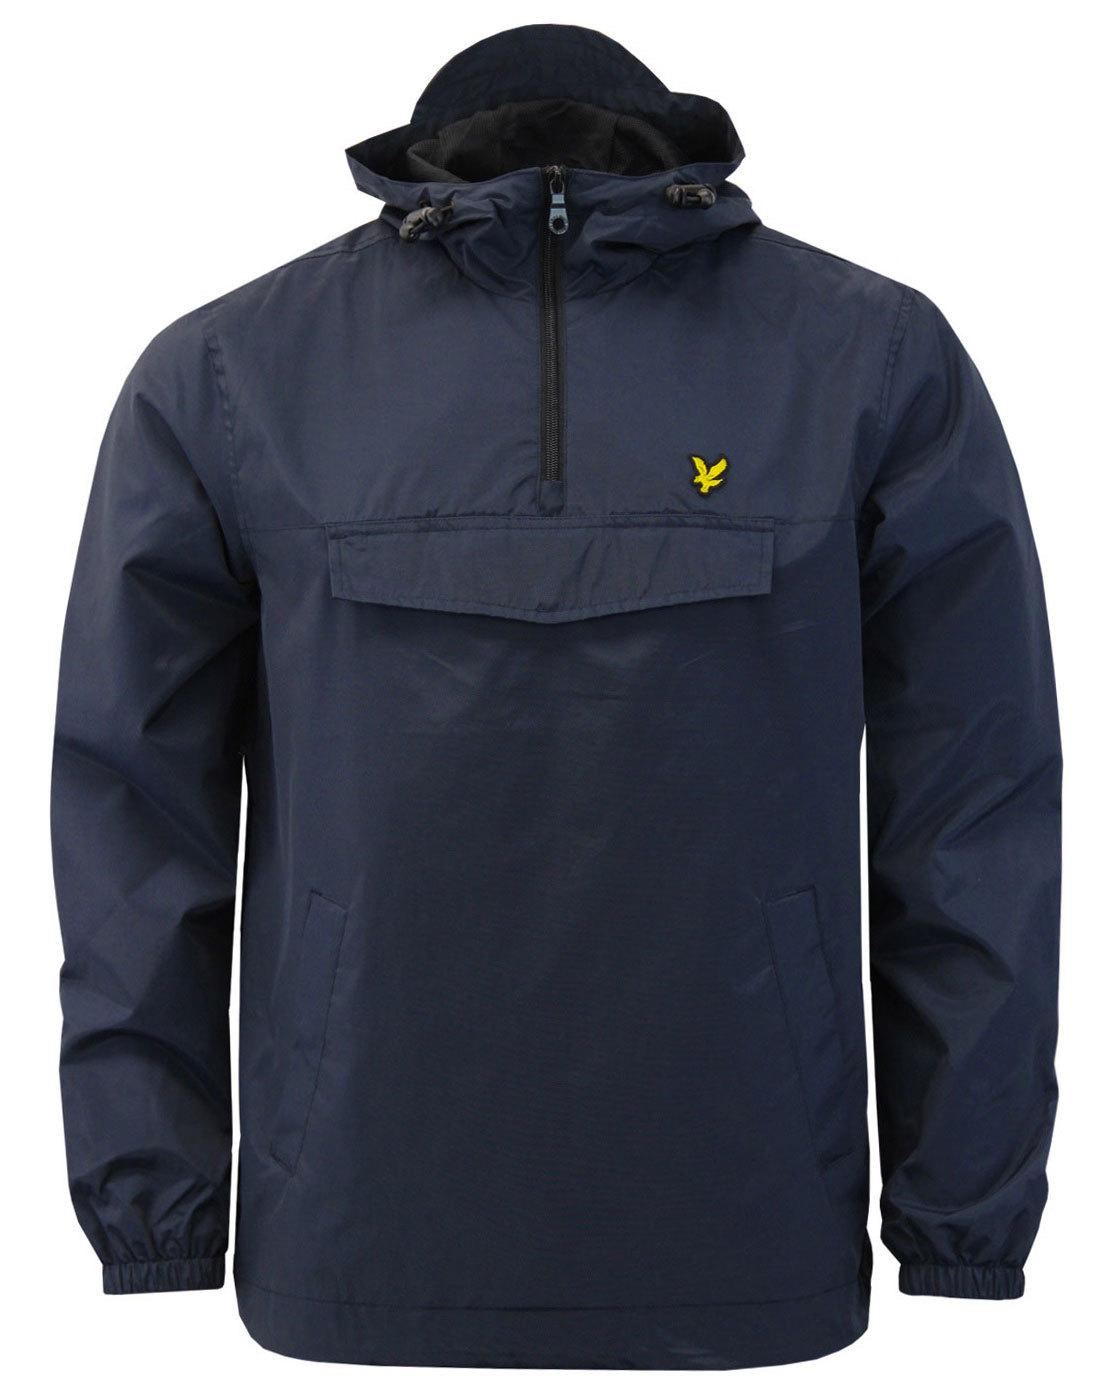 LYLE & SCOTT Retro Quarter Zip Overhead Jacket (N)